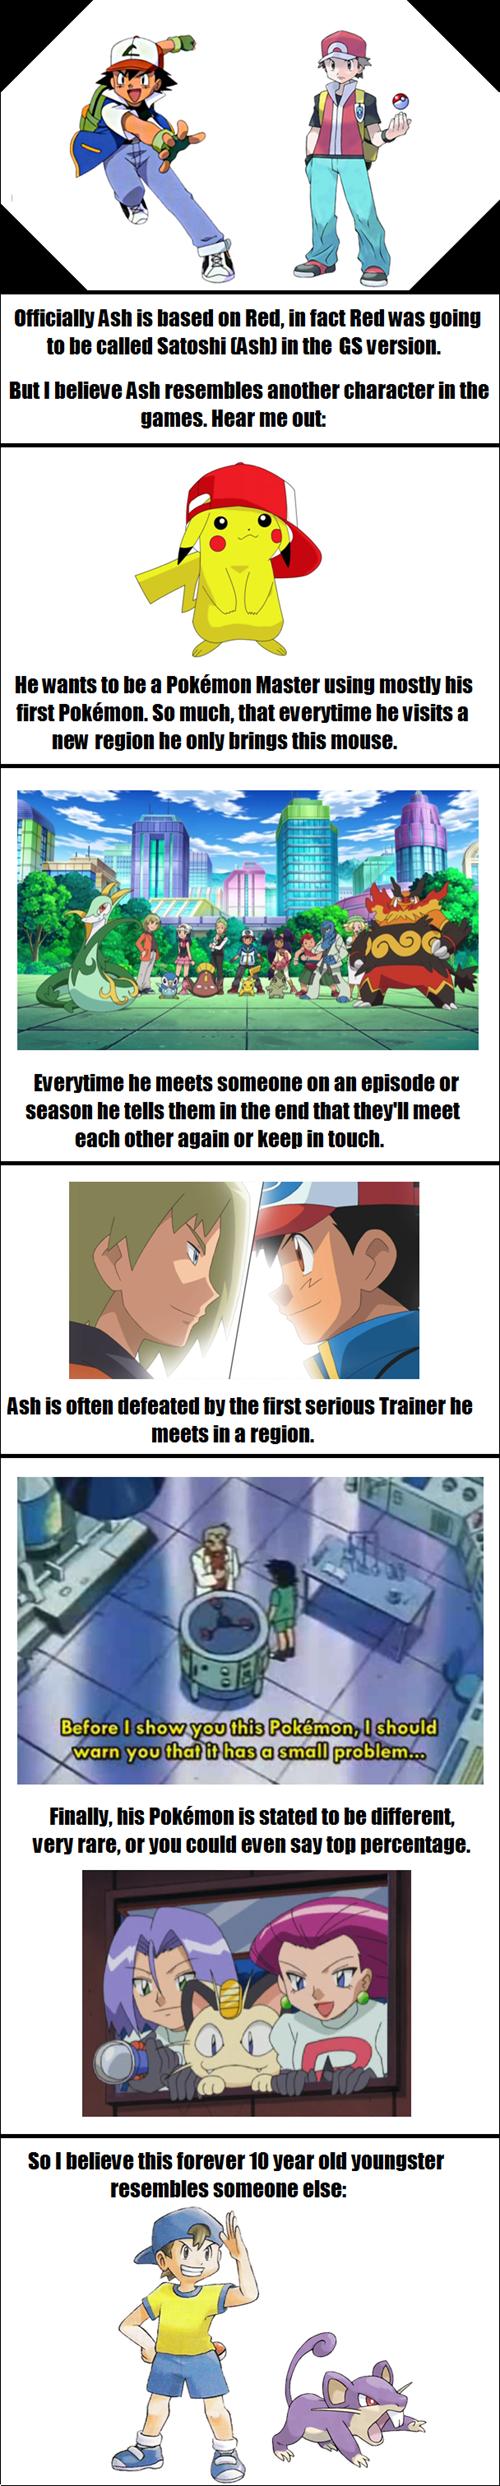 ash Pokémon red - 8136641792